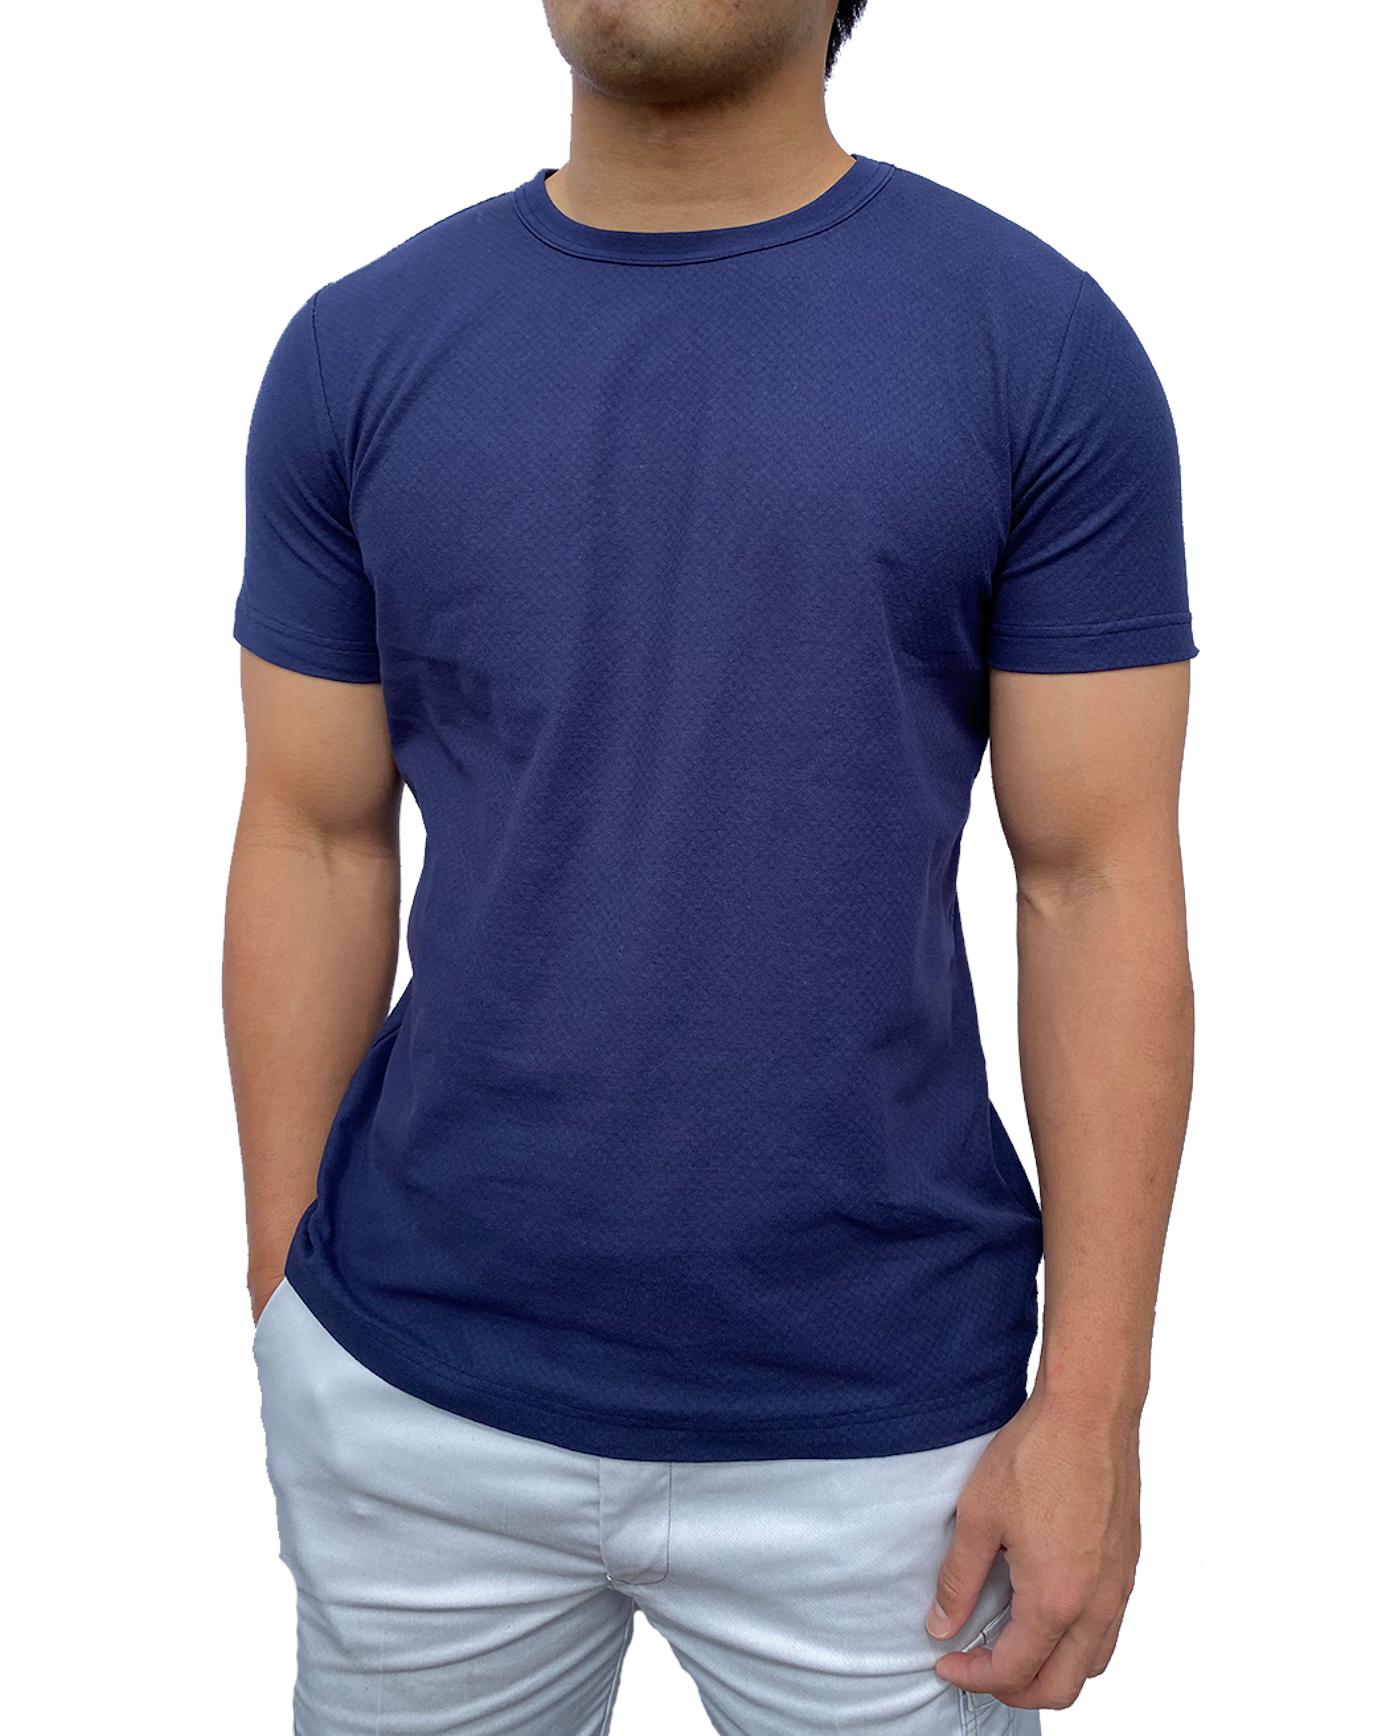 ARGO(アルゴ) 木綿 シャツ COOL <丸首・半袖> ~遮熱・放熱機能性アンダーウェア~